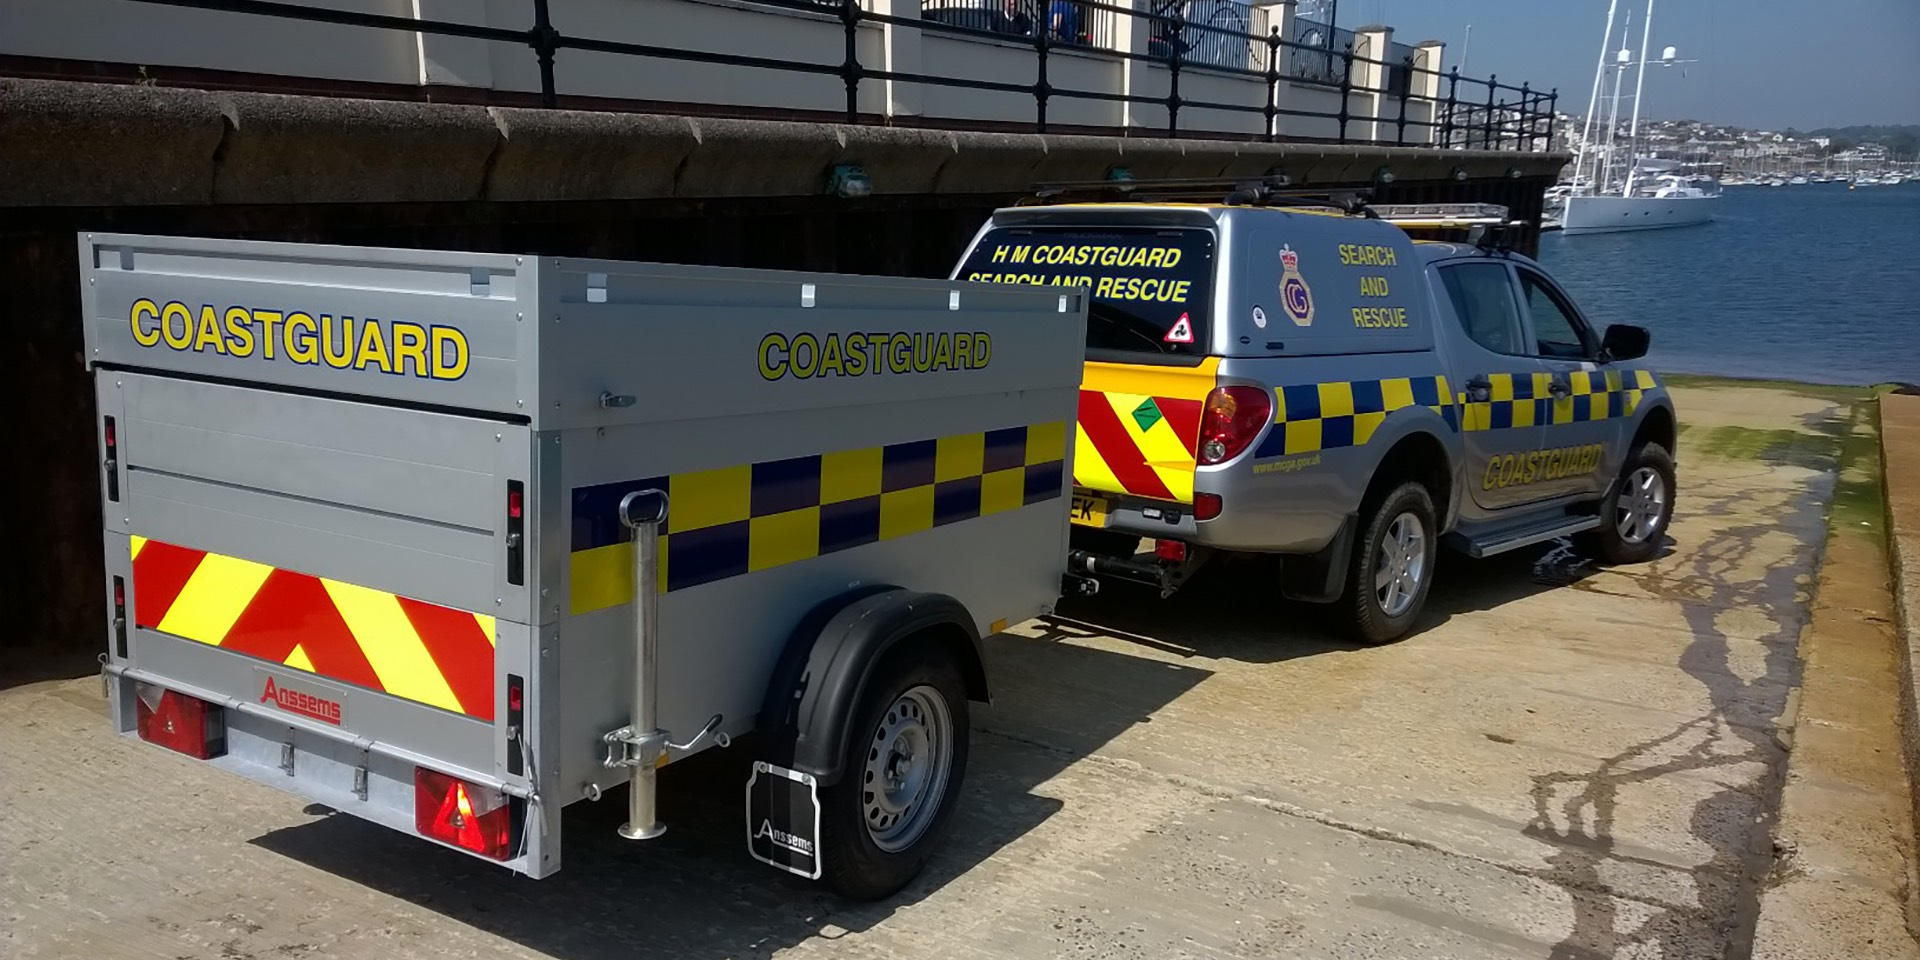 TrailerTek provides 75 customised trailers for the Coastguard